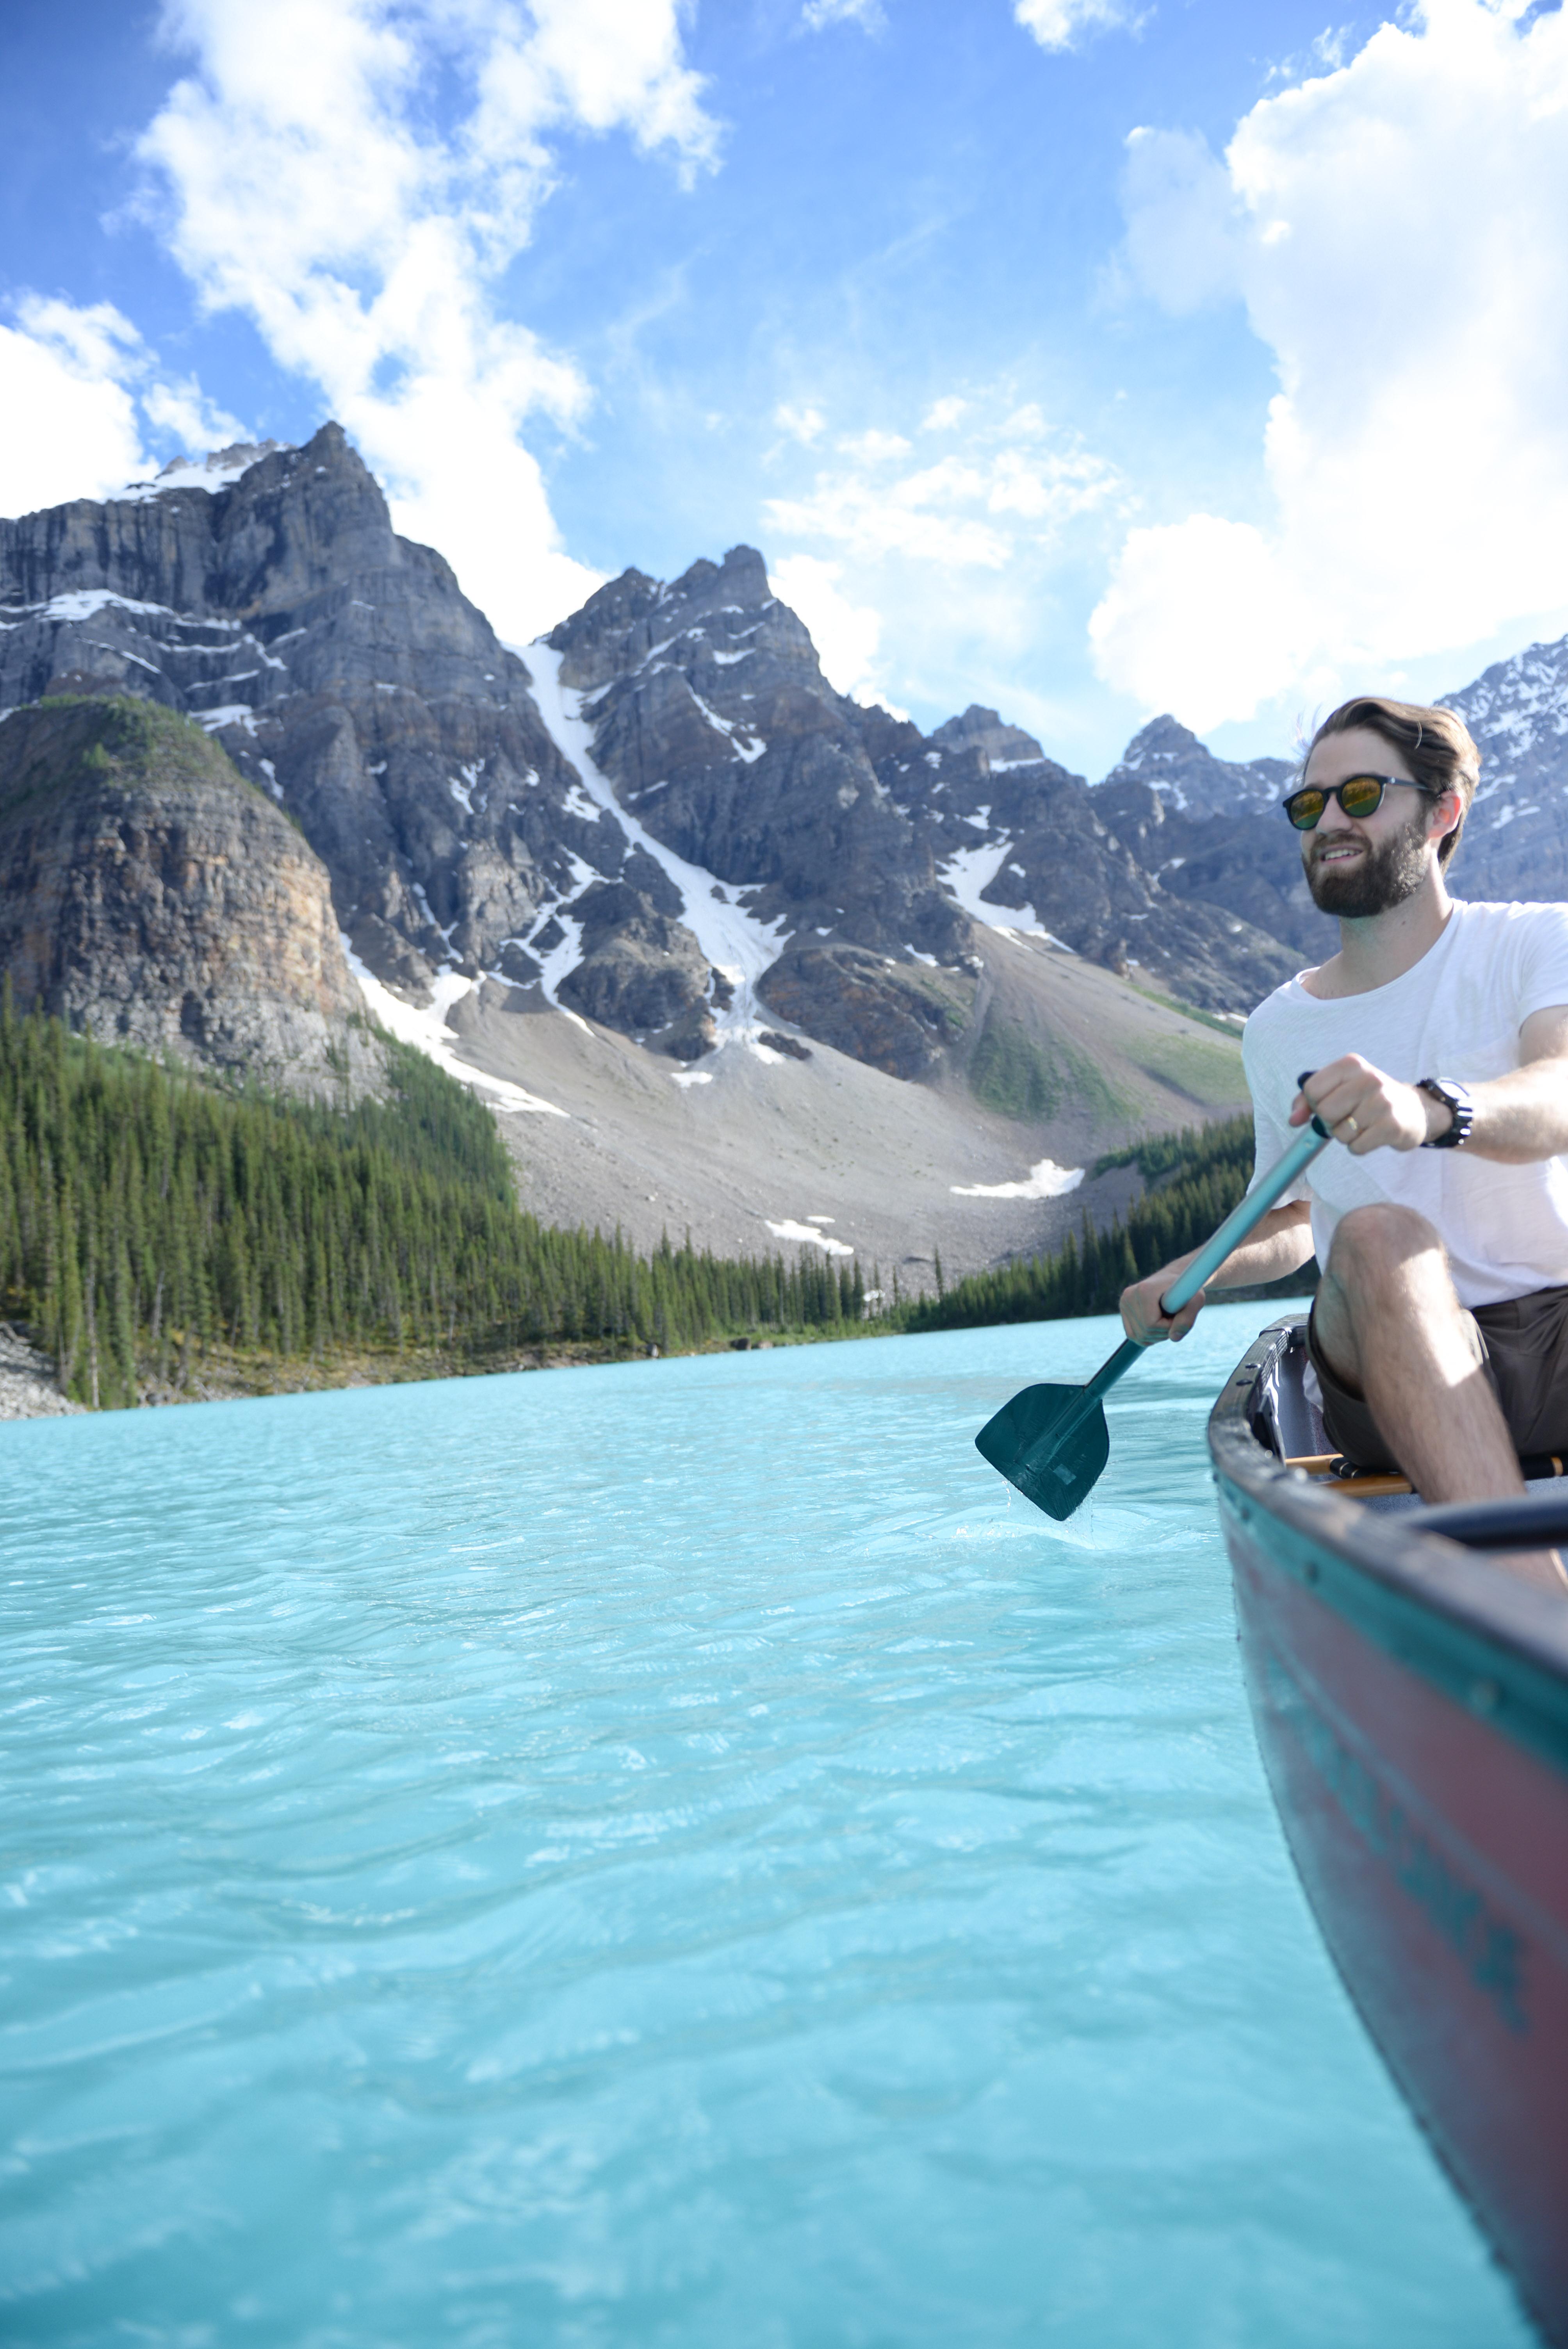 Summer Road Trip to Banff, Alberta - Canoeing Moraine Lake